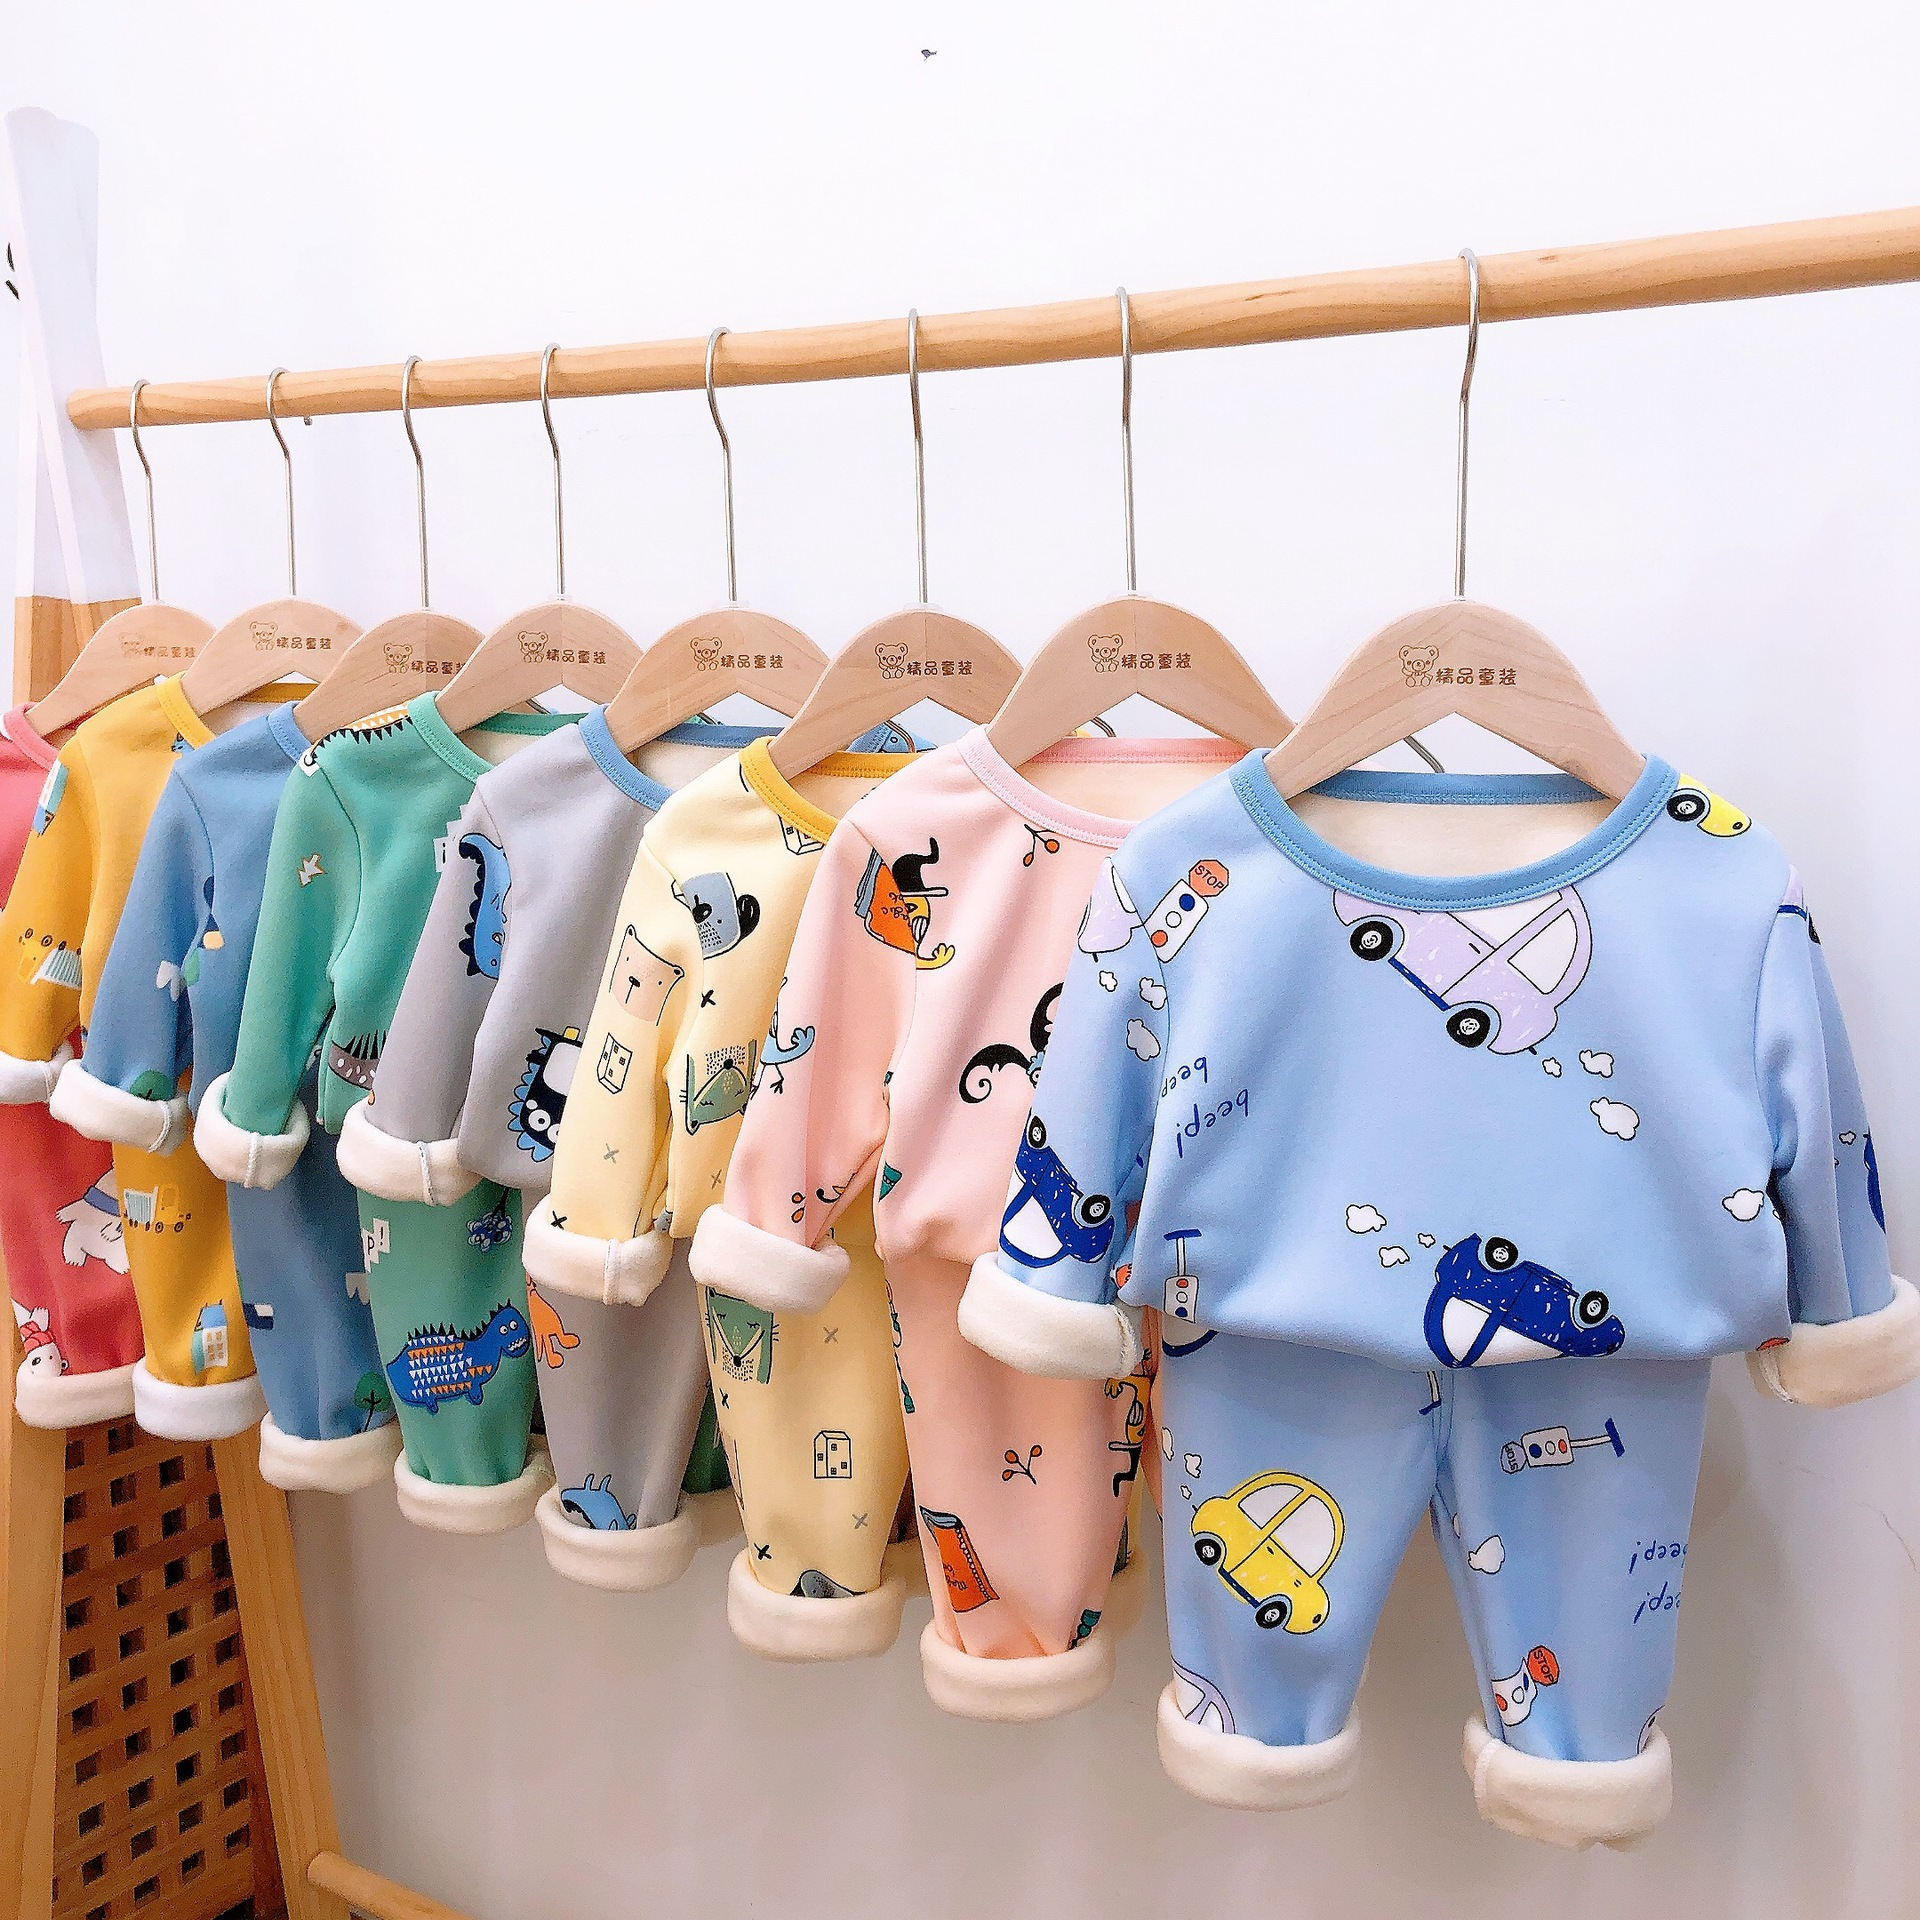 2021 Autumn Winter Thicken Velvet Children Pajamas Cartoon Family Boys Girls Clothing Set Kids Casual Sleepwear Suits Clothes 2